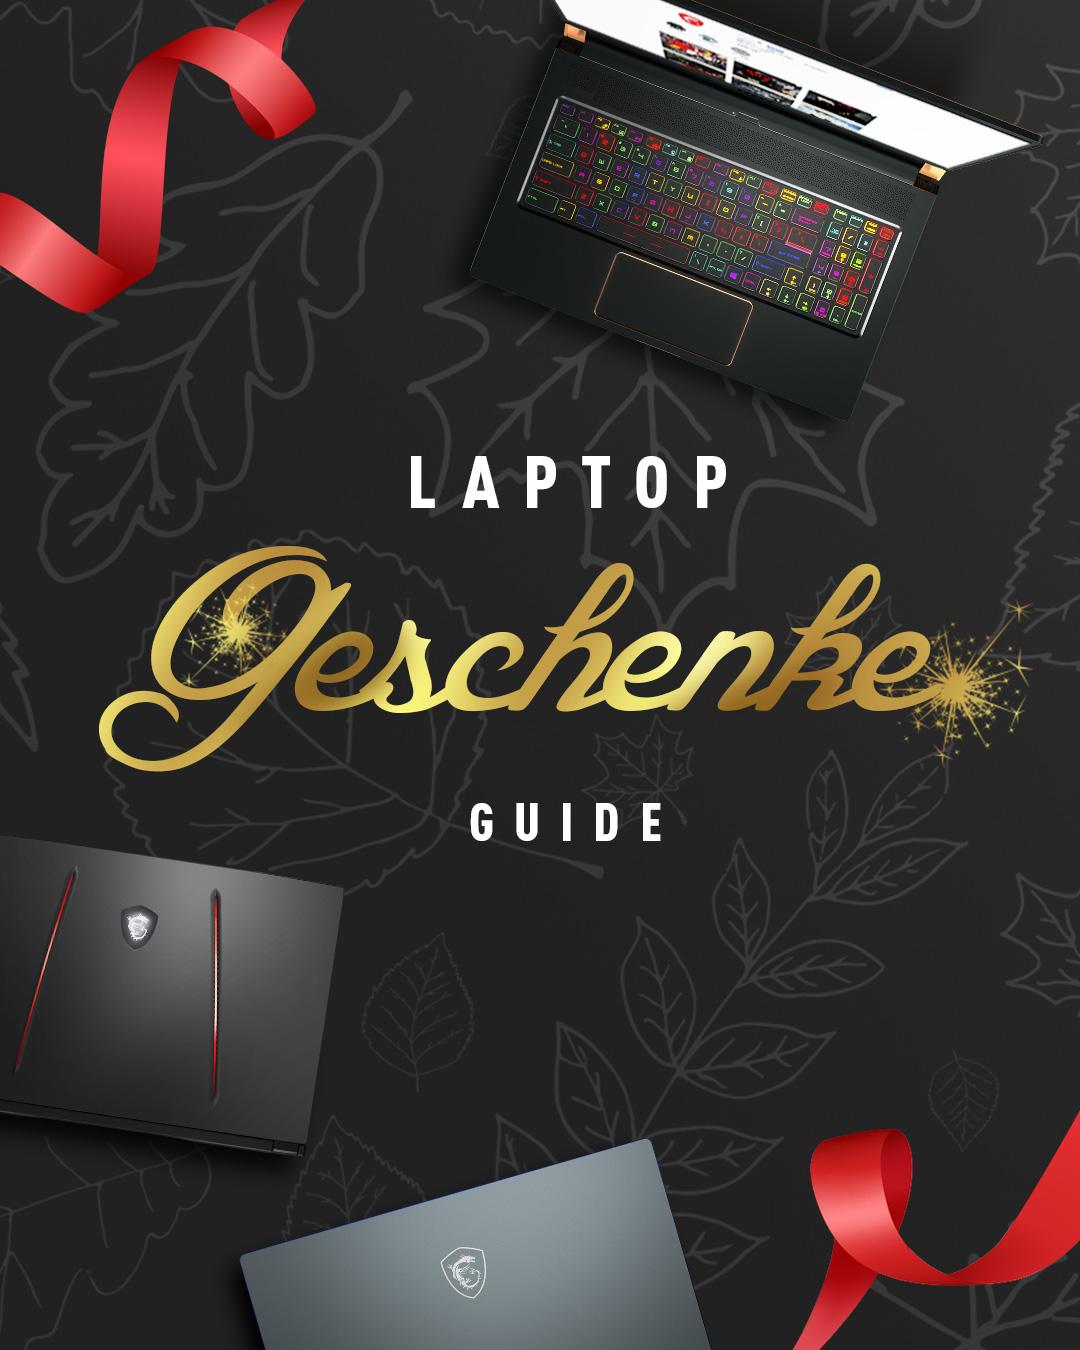 Laptop-Geschenke-Guide